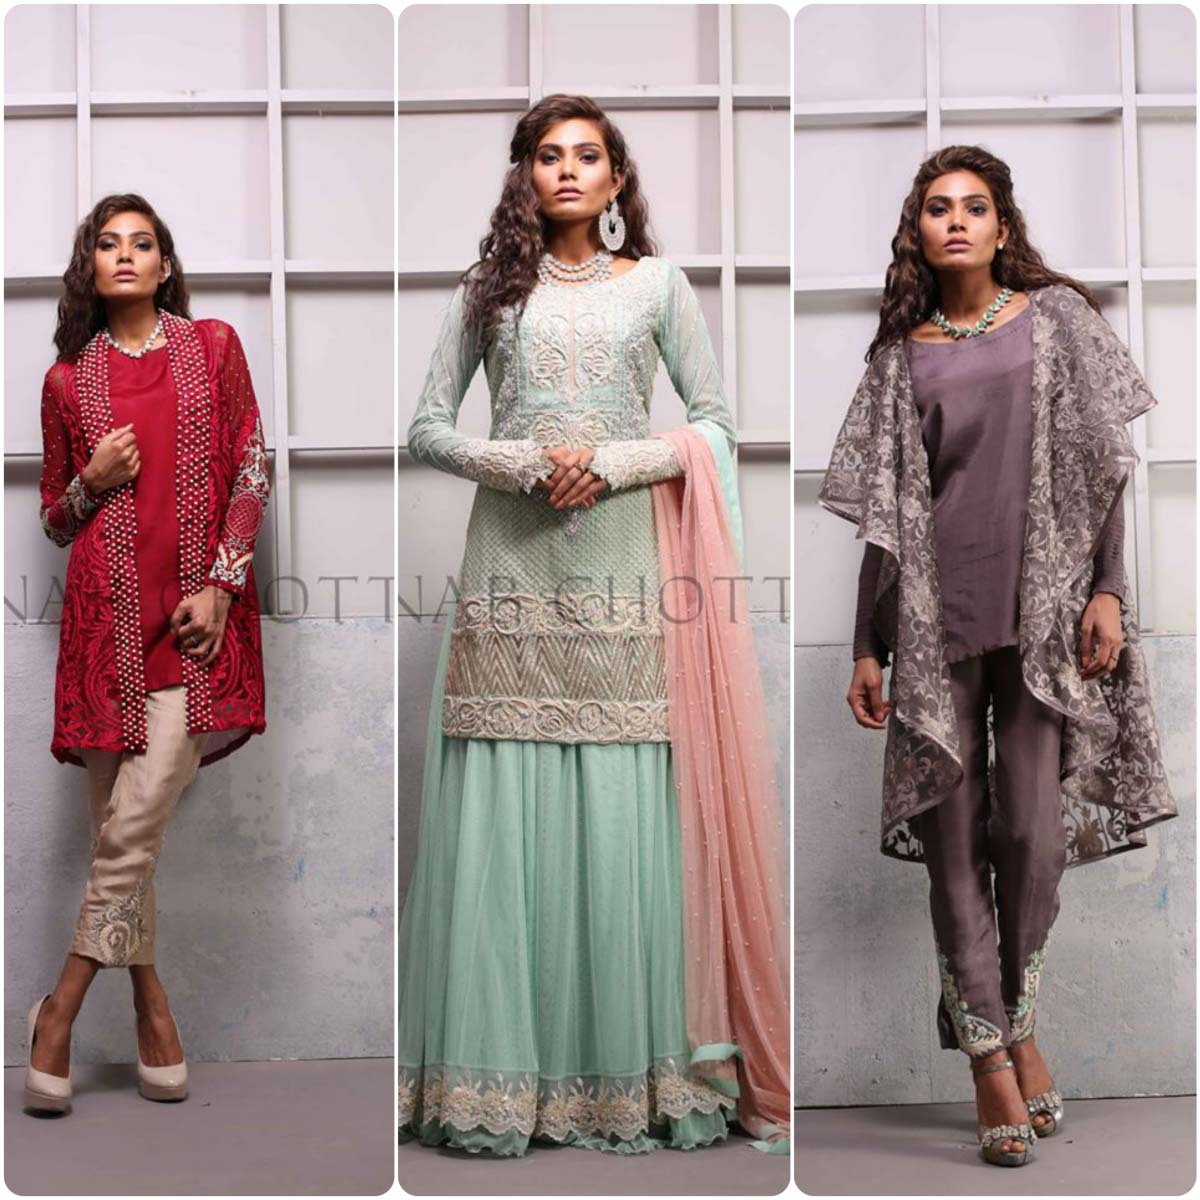 8f9840d747 Shariq Textiles  Zainab Chottani Pret Collection 2016   Stylo Planet